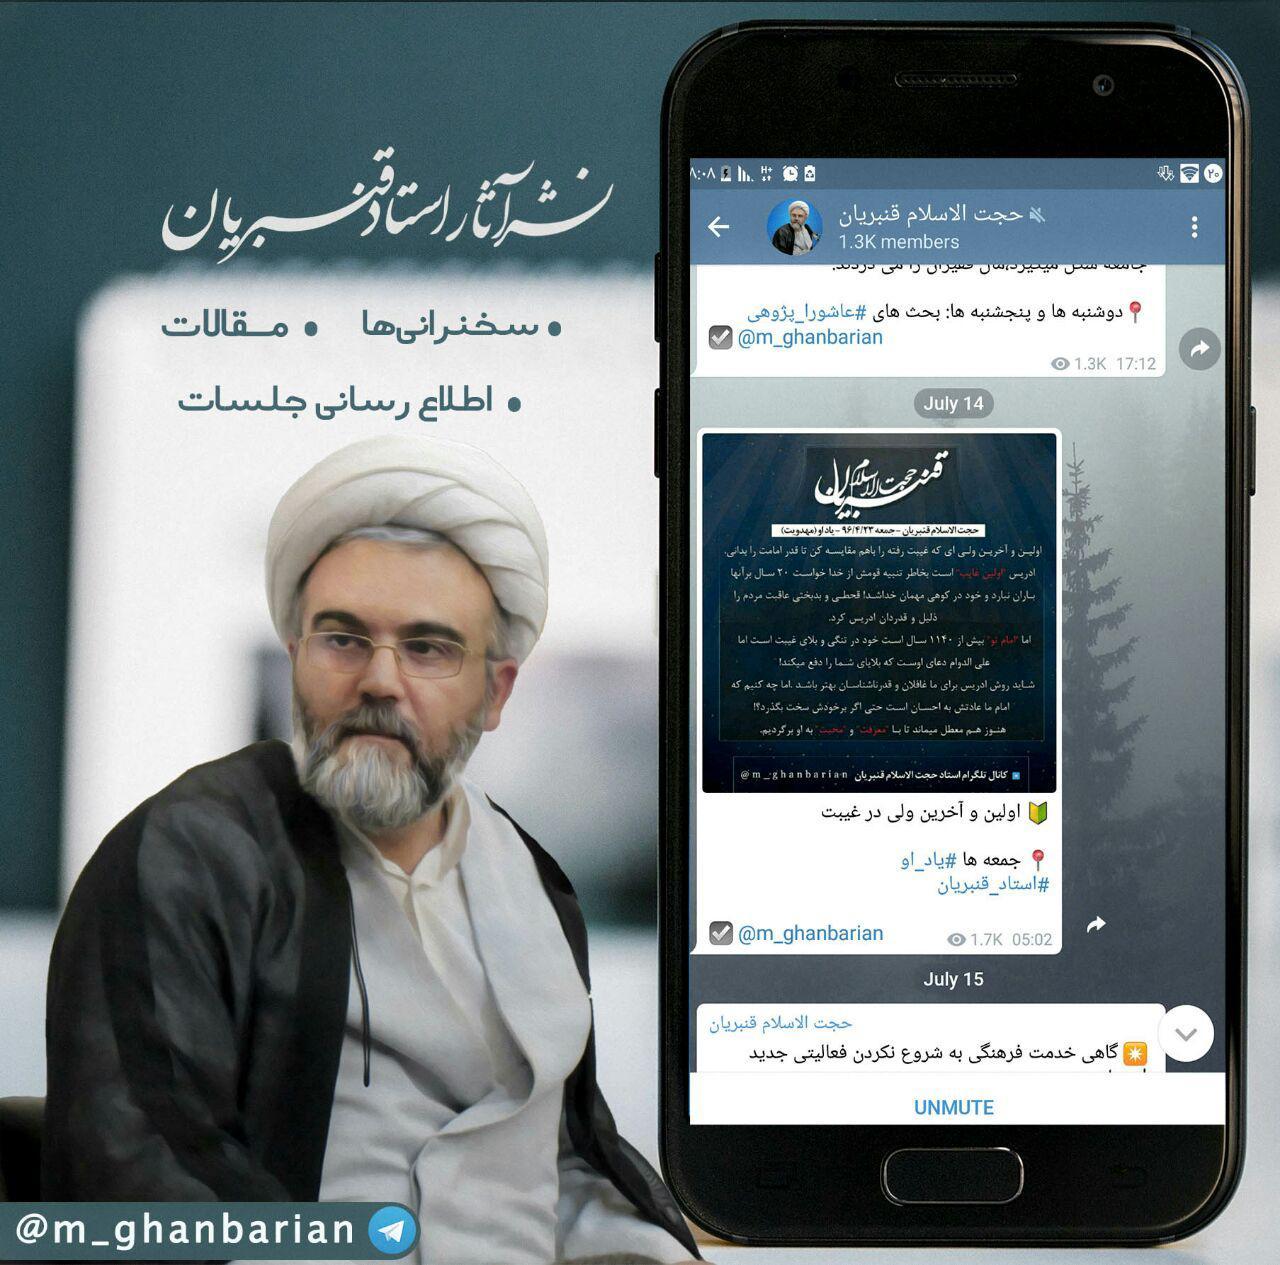 کانال رسمی حجت الاسلام قنبریان